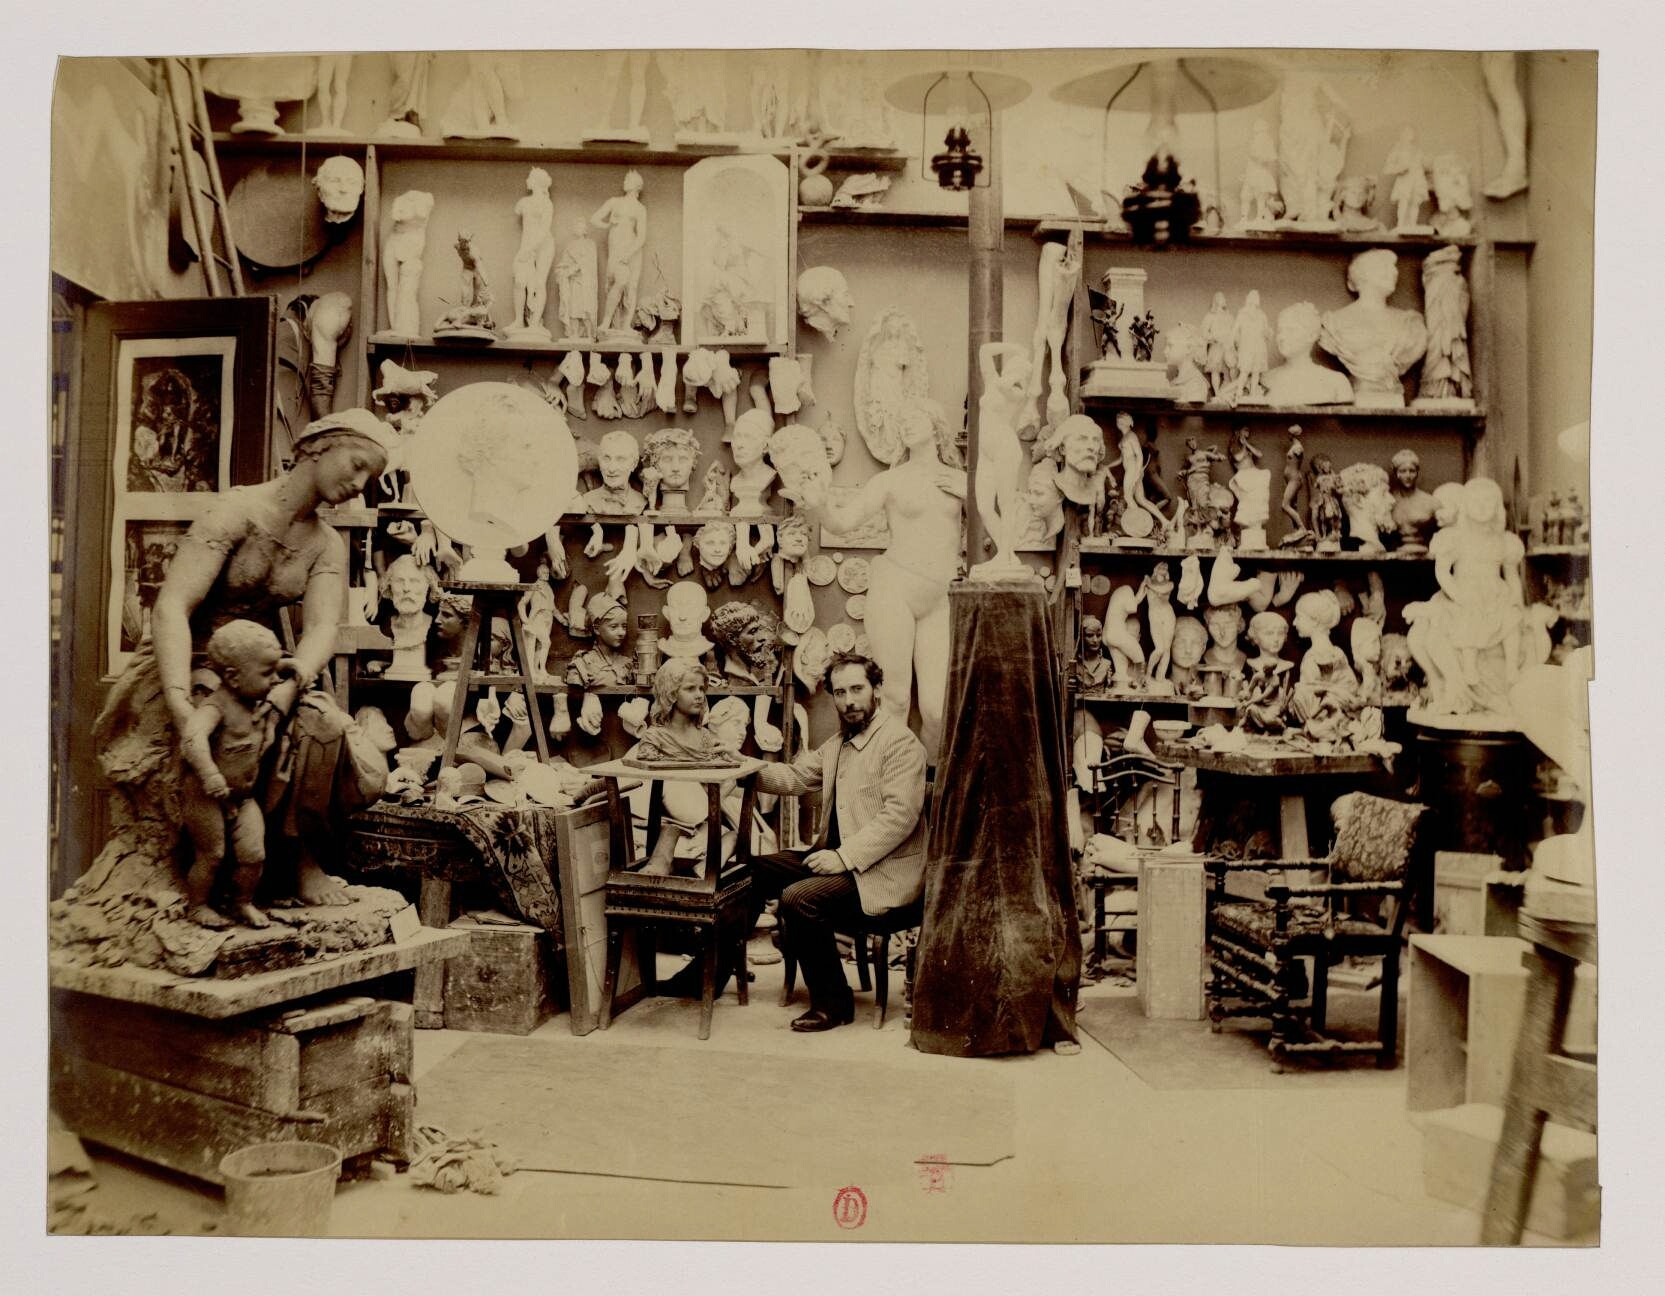 22. Анри-Оноре (1853-1922) (скульптор) - скульптор и медальер. Ученик Матурена Моро